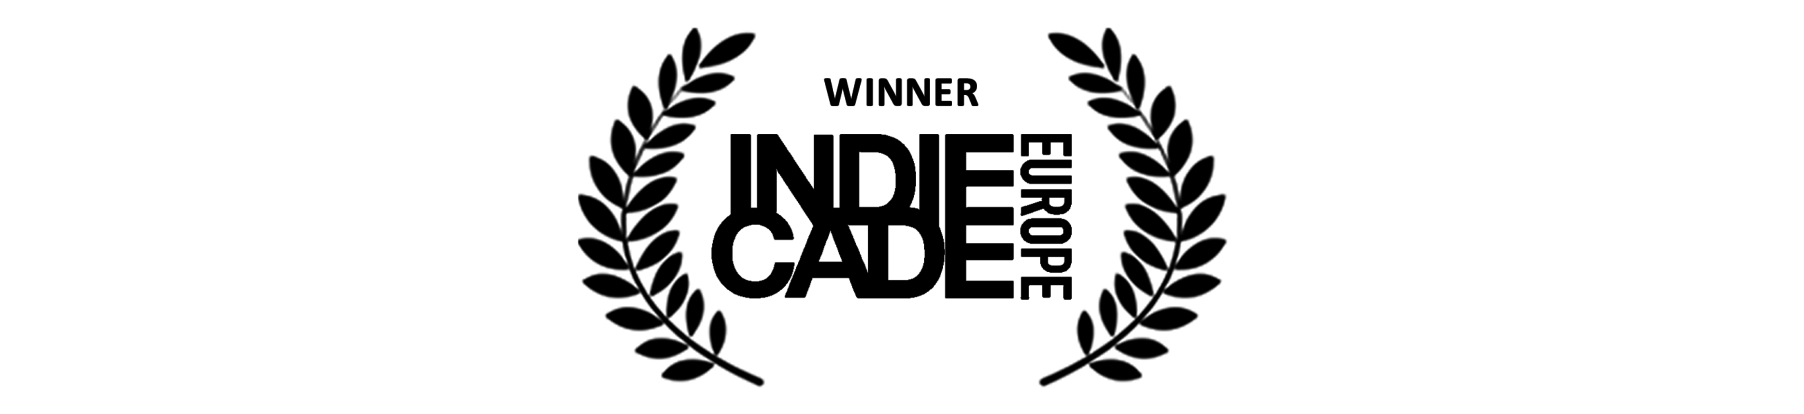 IndieCade.png